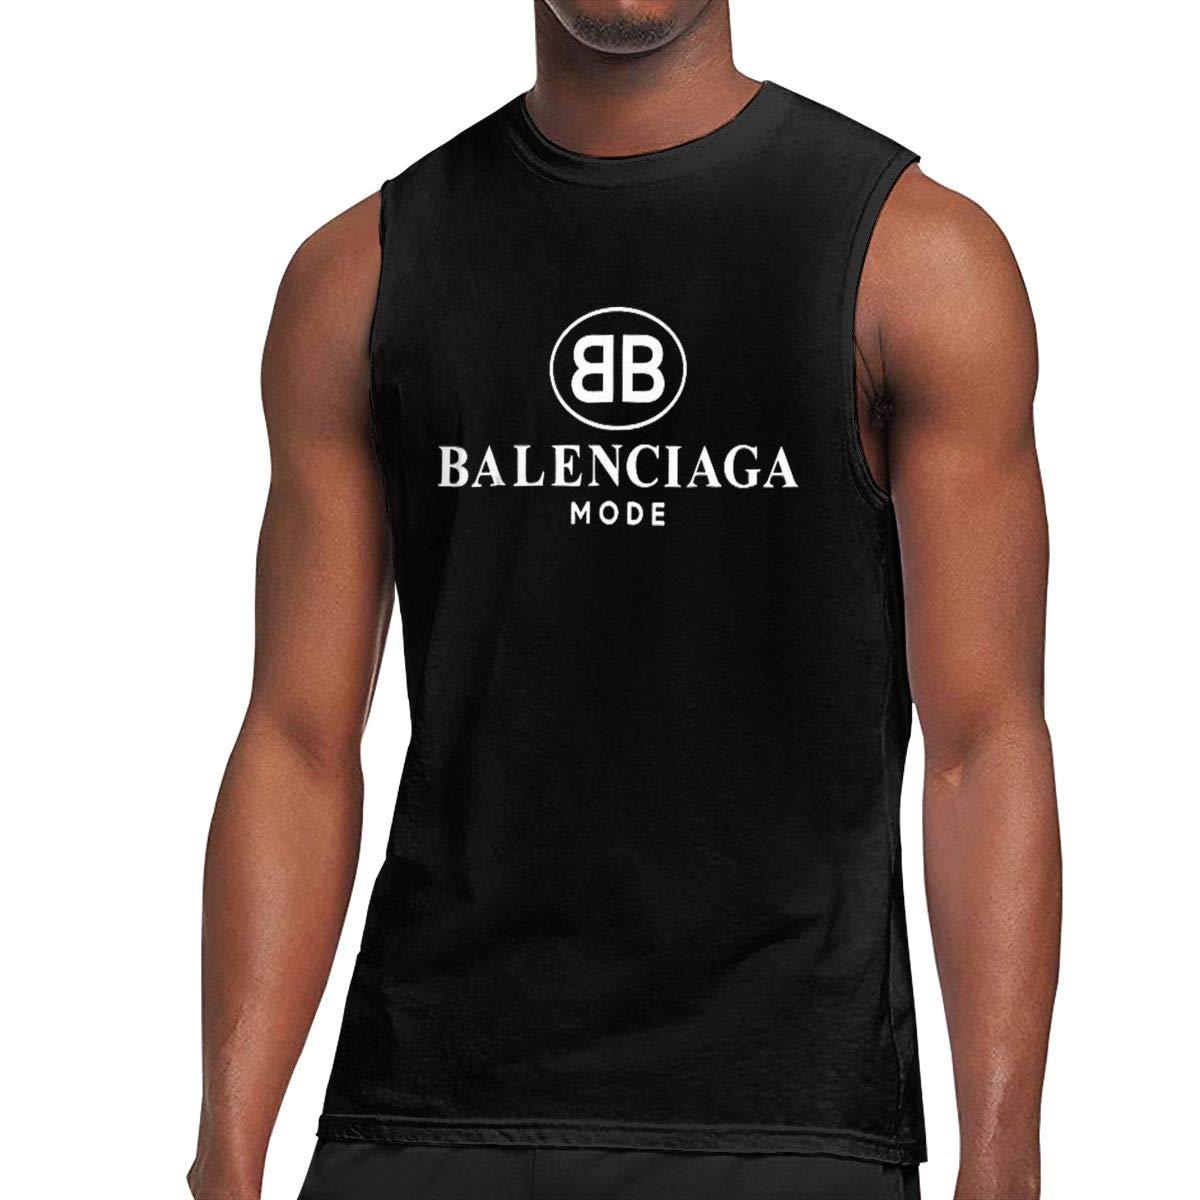 7316d16b Amazon.com: Balenciaga Vest Men's Crew Neck Sleeveless T-Shirt Sports top  Black Gym Wear Solid T Shirt for Unisex: Clothing